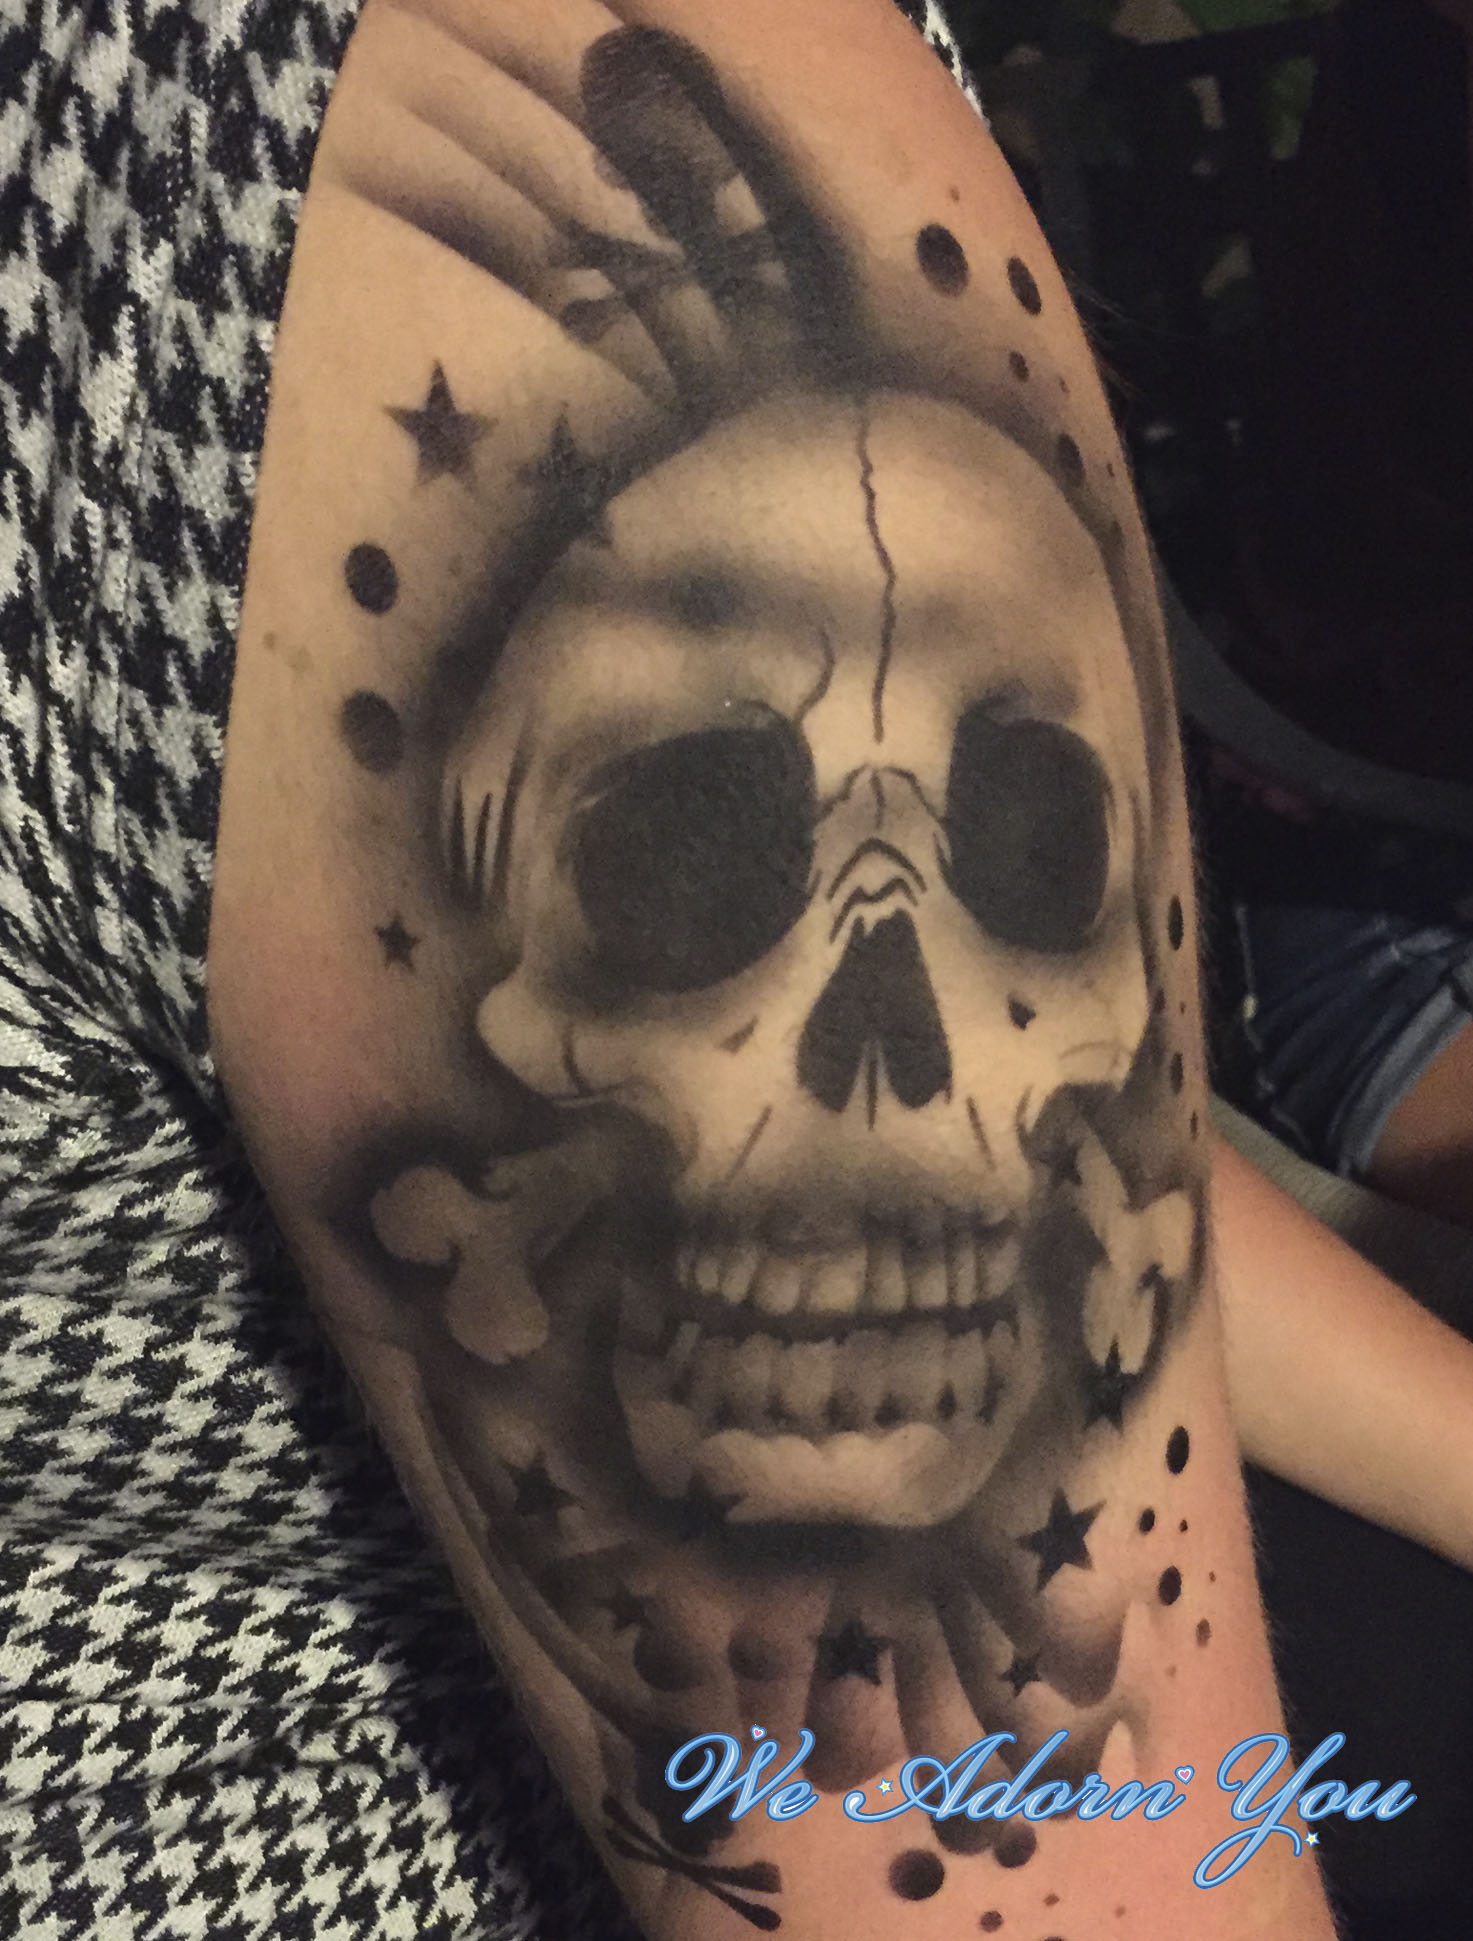 Premium Airbrush Tattoos - We Adorn You.jpg